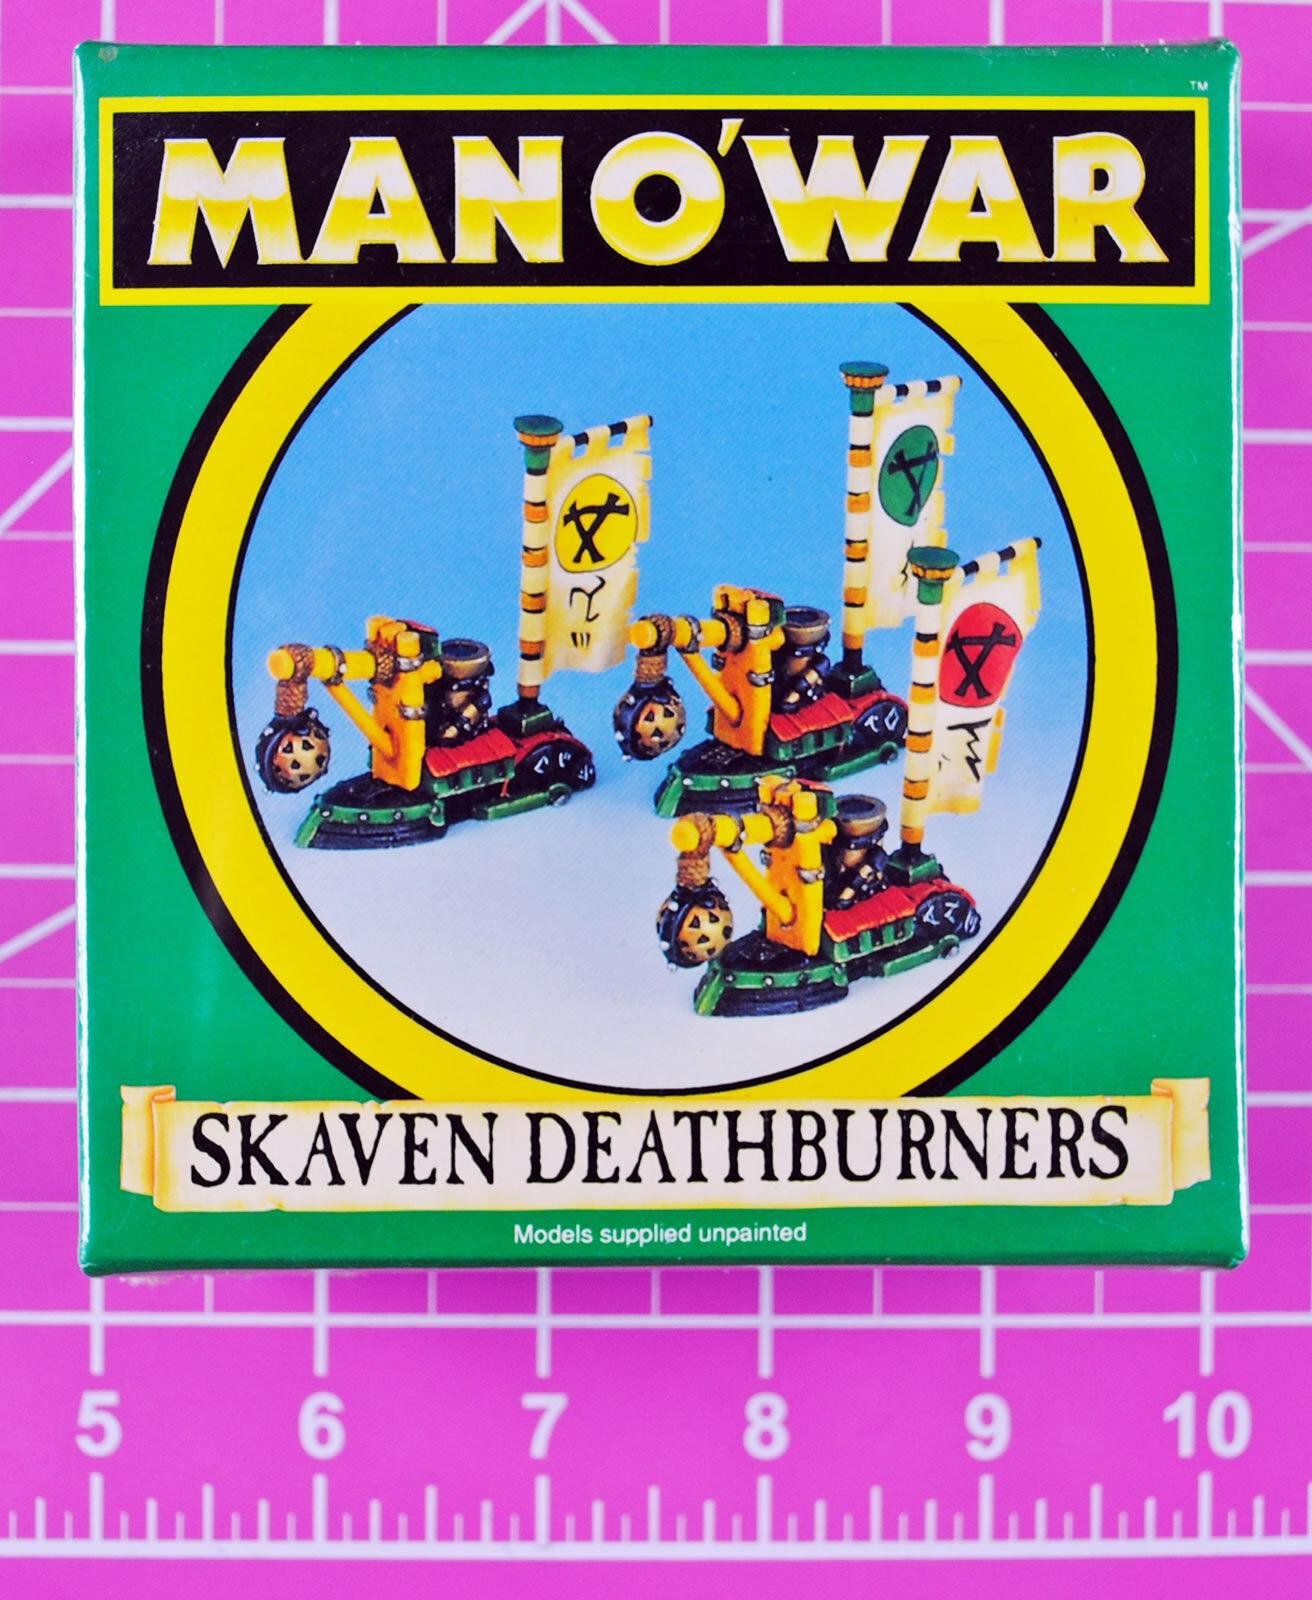 Man O War Skaven Deathburners NIB - Rare & OOP - Games Workshop Manowar Ships